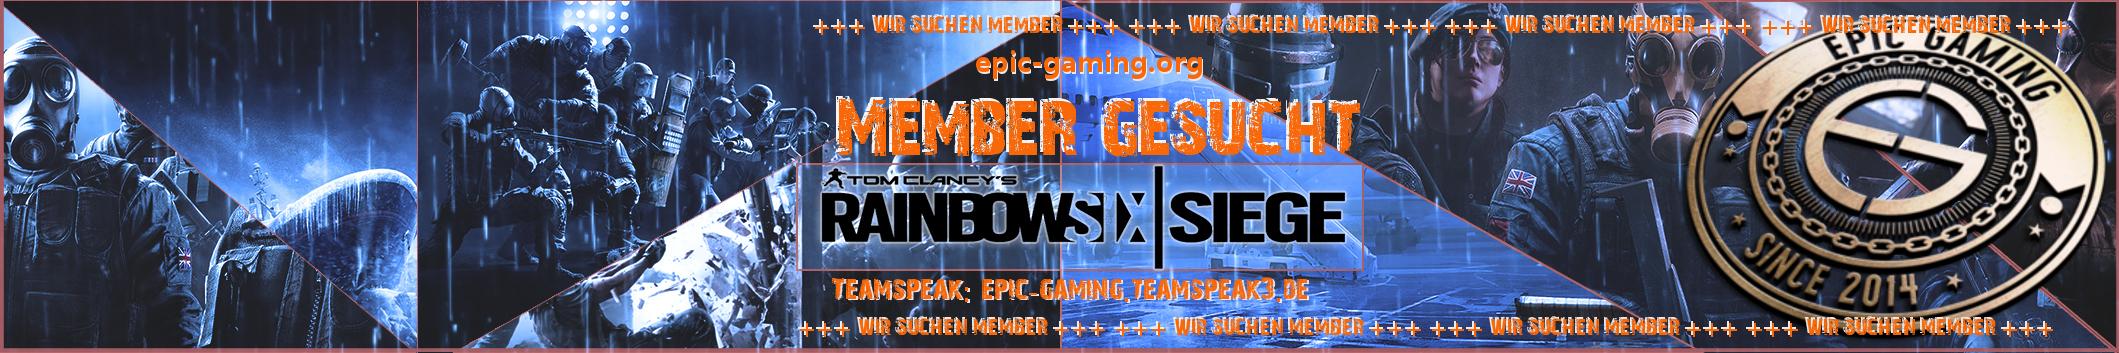 Membersuche Rainbow Six Siege